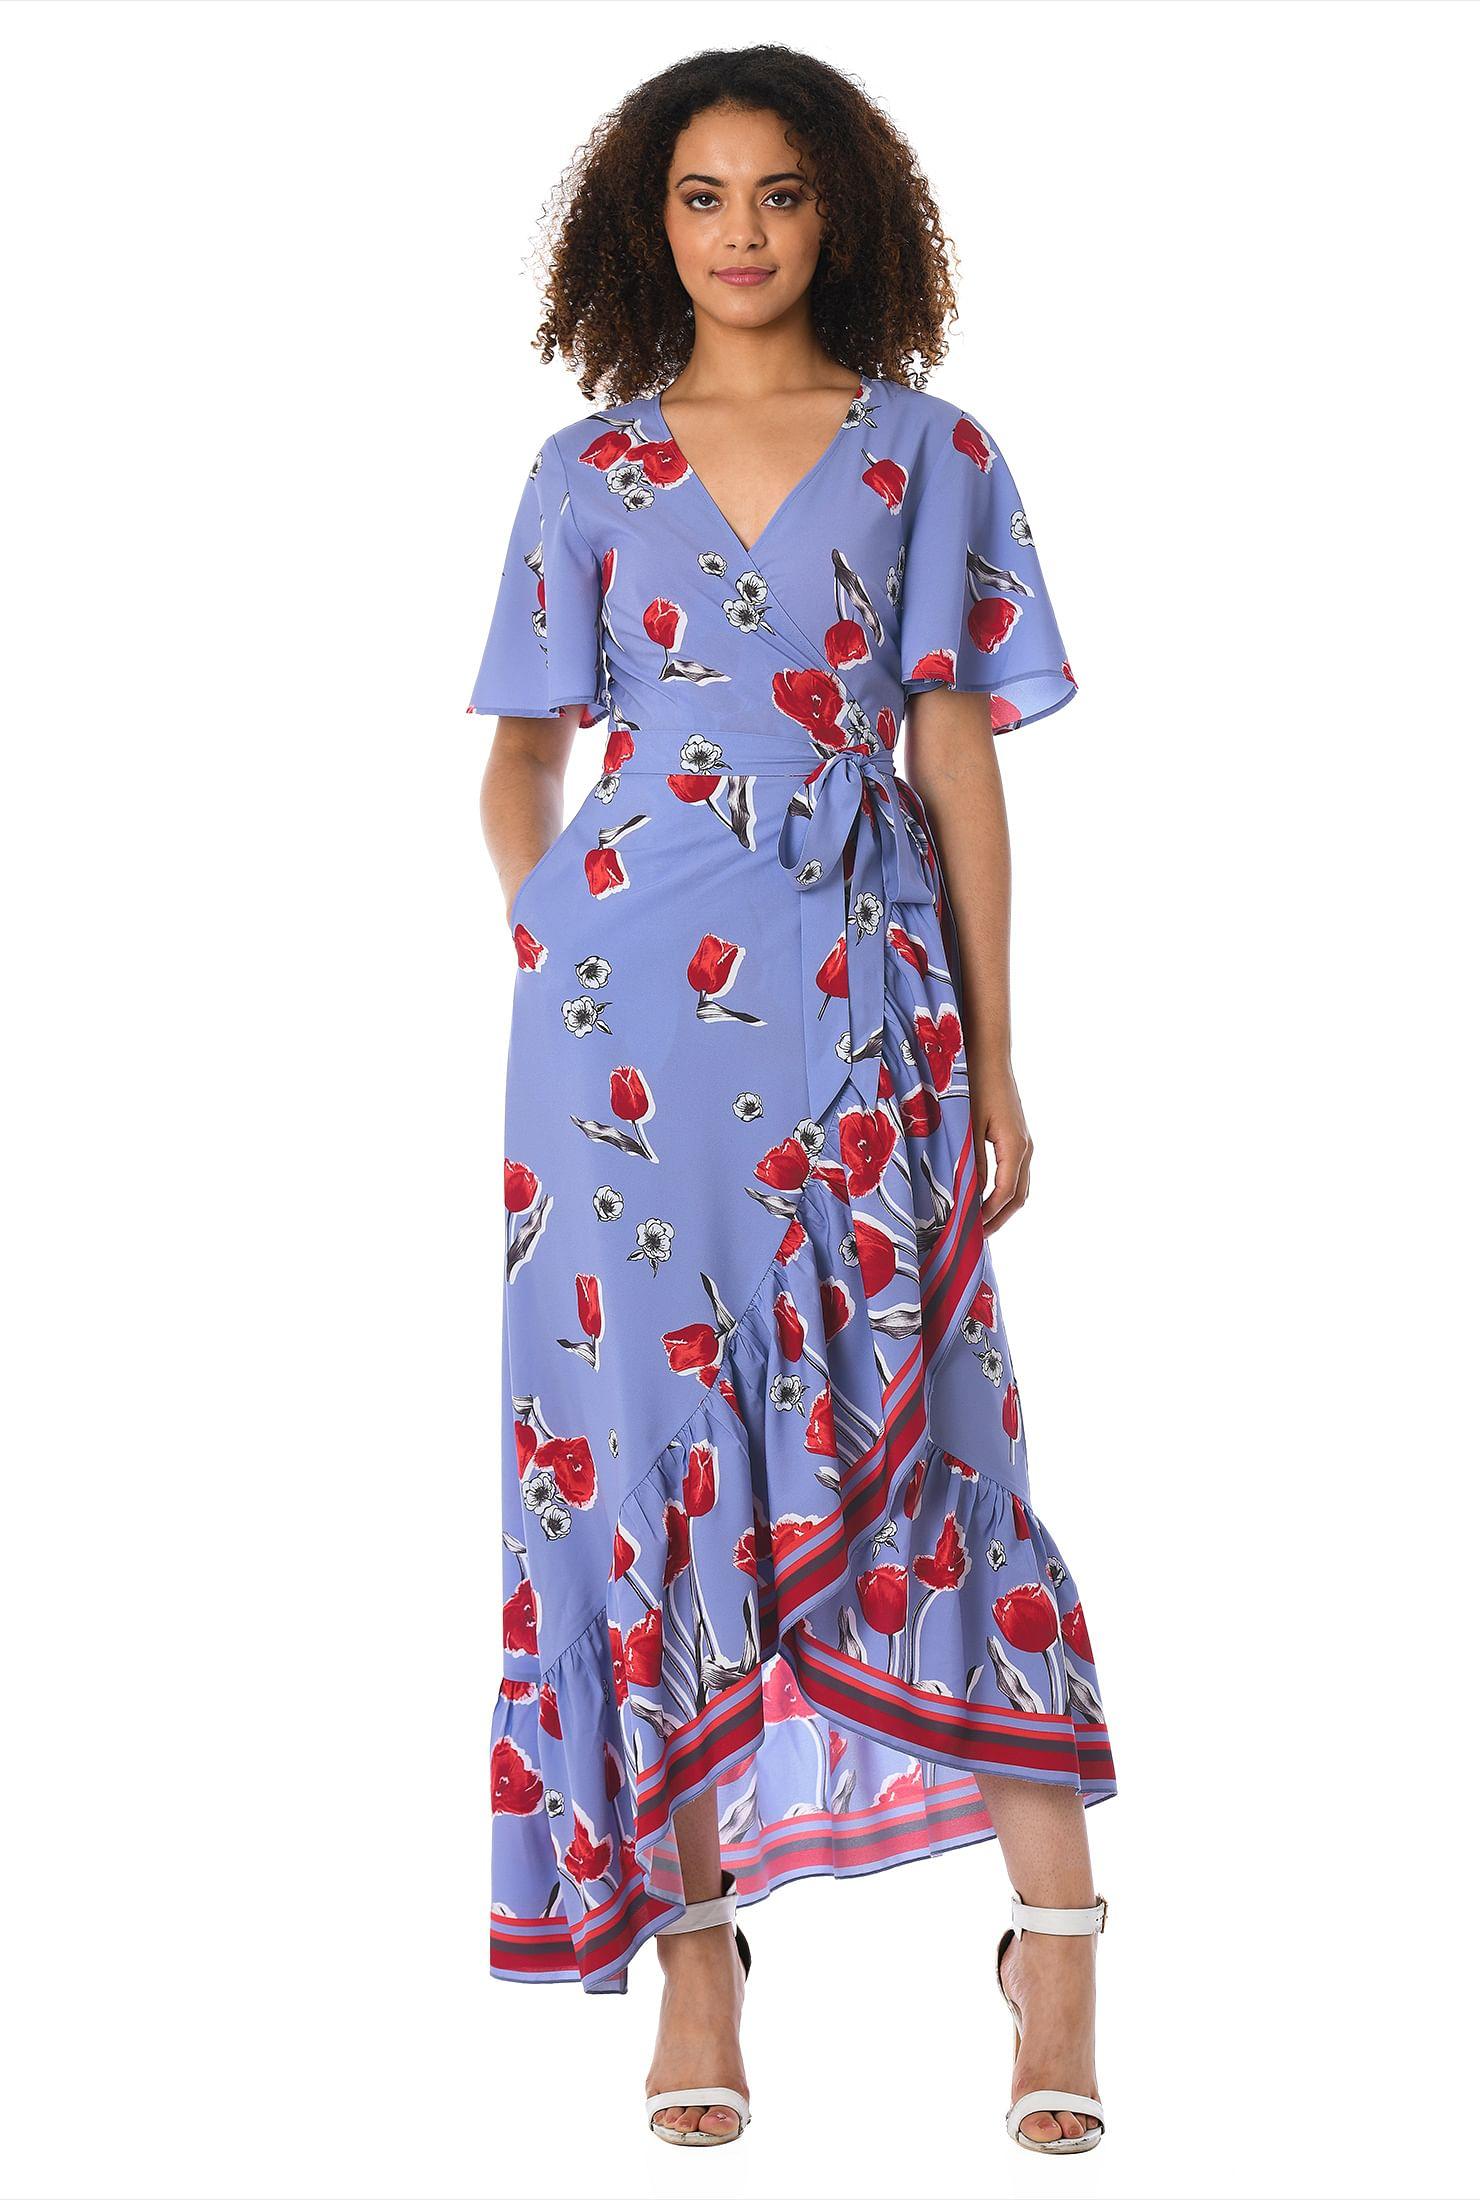 9e2cf56a29dac ... Ruffle tulip print crepe wrap dress. , asymmetric hem dresses, cap  sleeve dresses, crepe dresses, day dresses, lightweight